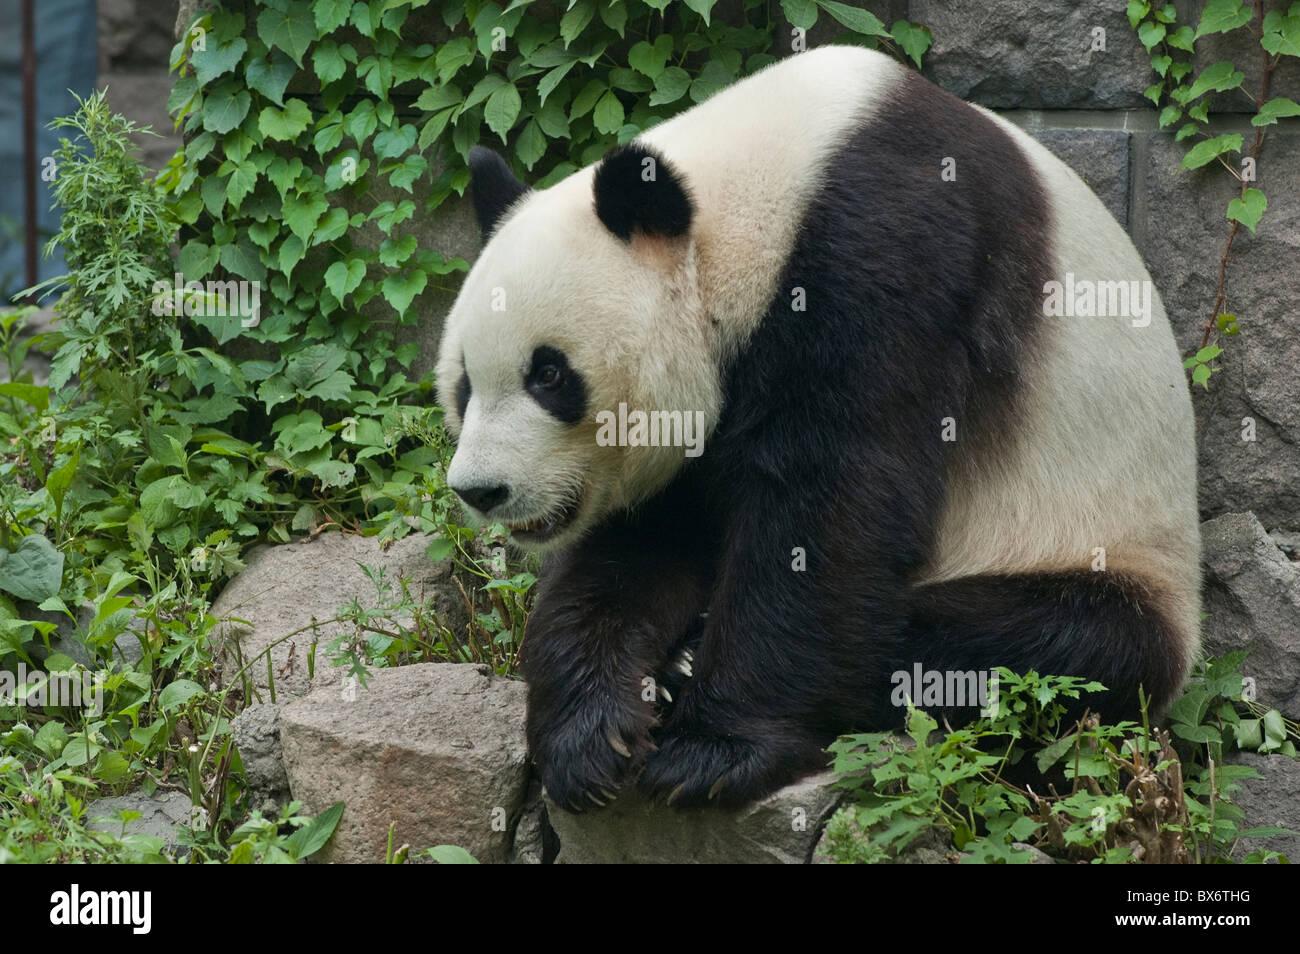 Giant panda sitting on a rock at Beijing Zoo, Beijing, China. - Stock Image